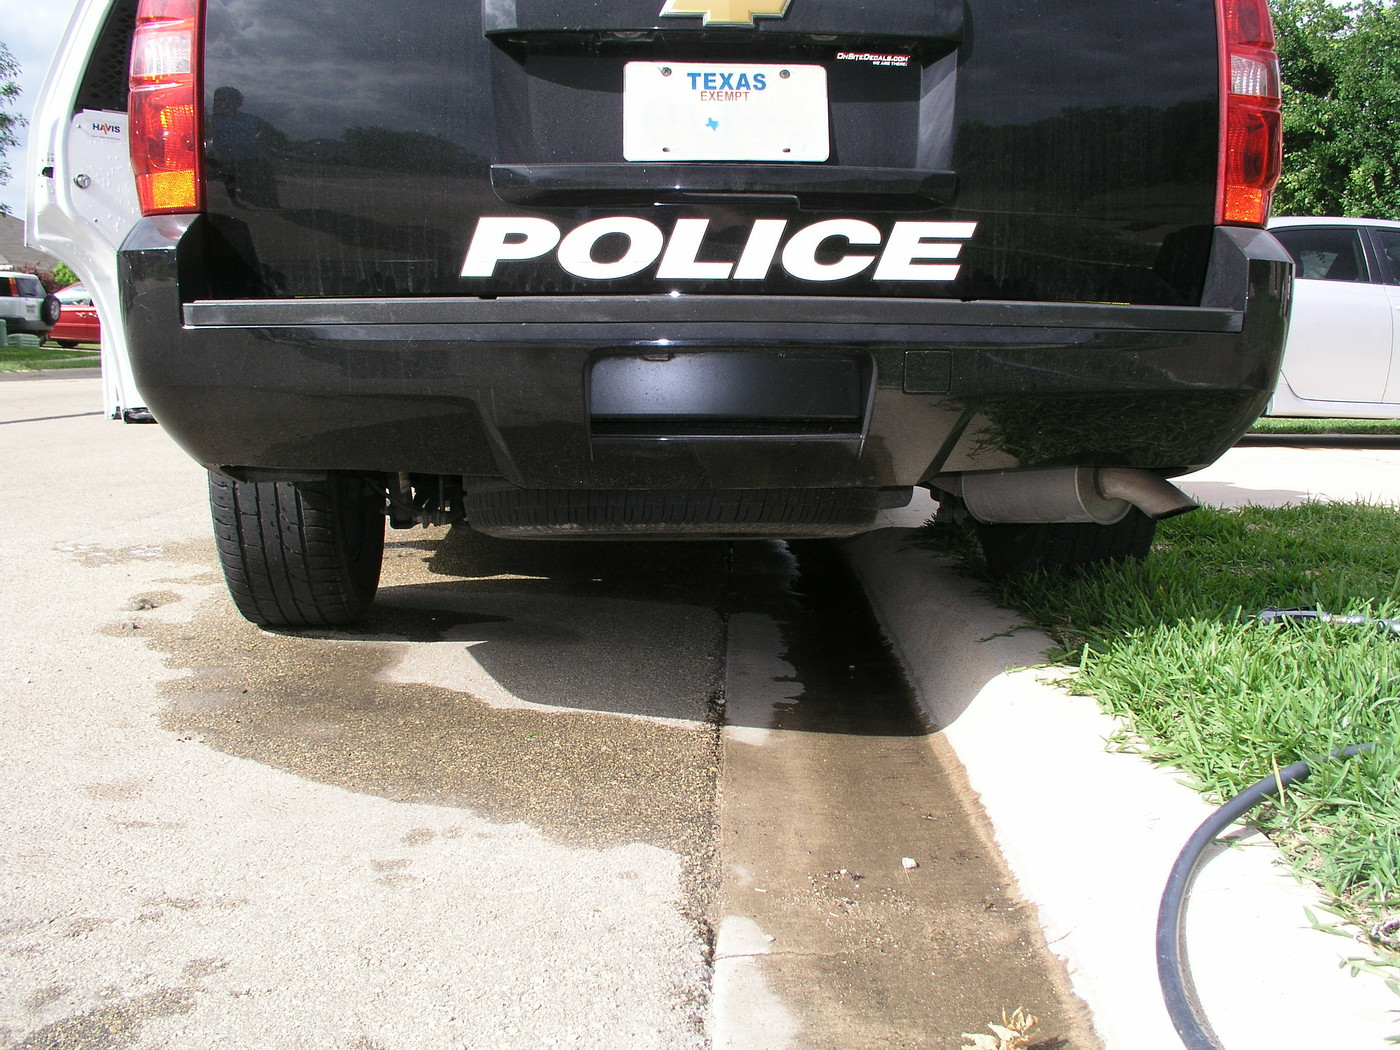 Chevy SUV Police K-9 Unit  BillAustinPic18 plate3digitsLeft4Rt